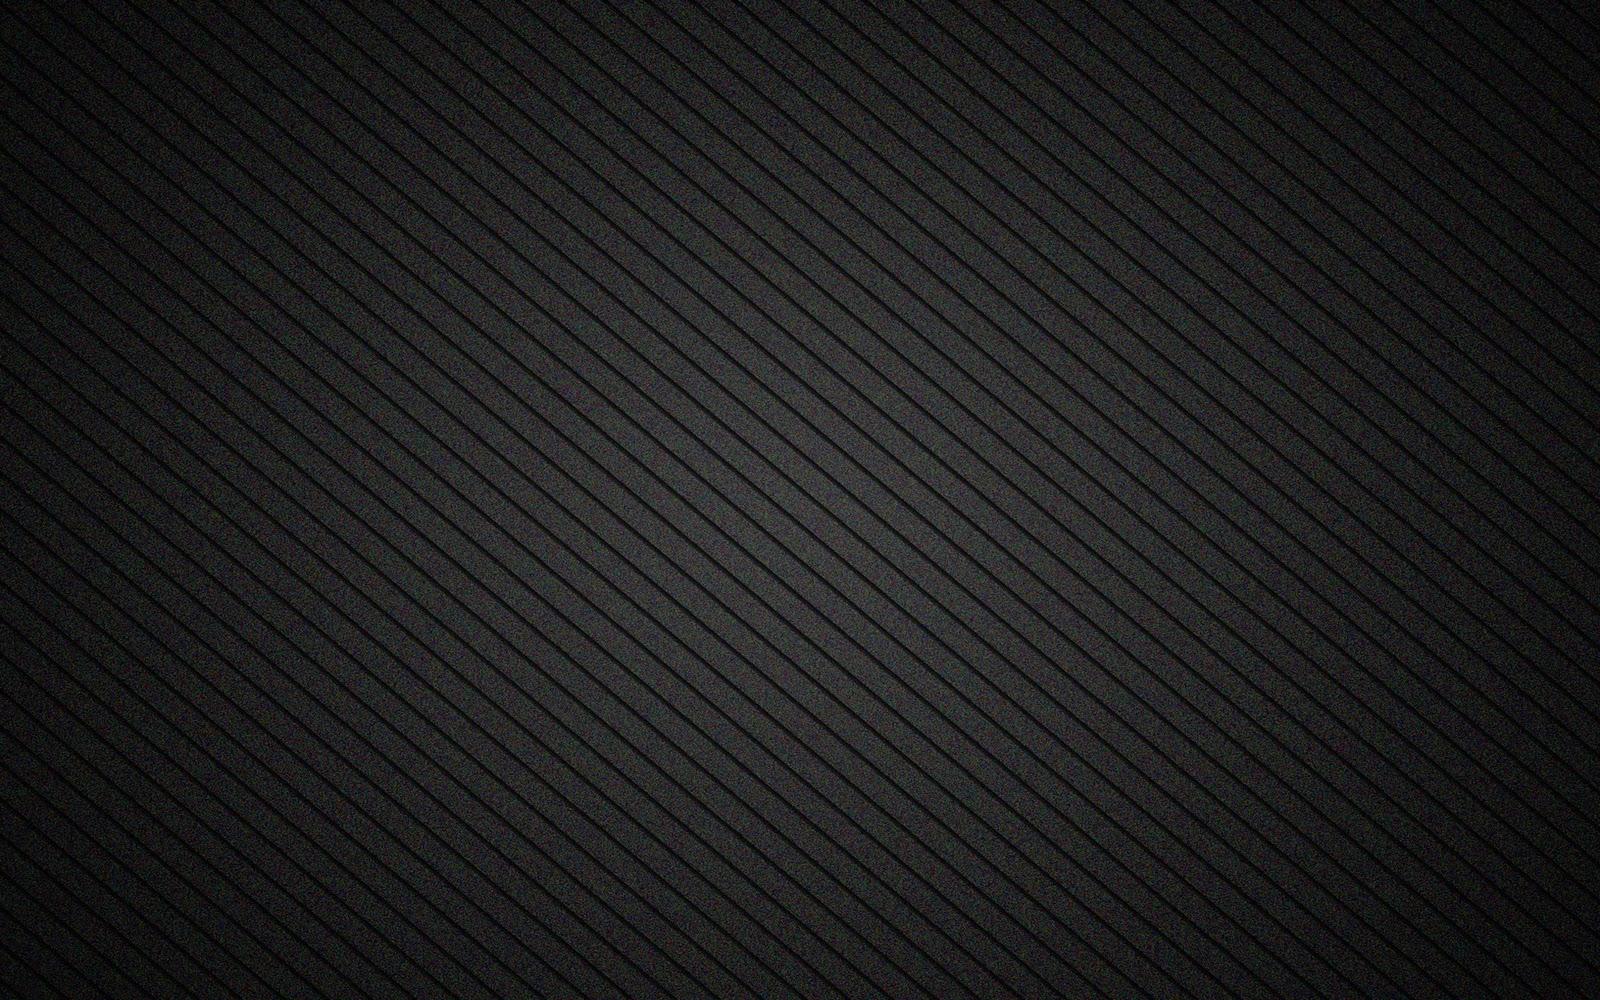 background hd dark wallpapers desktop grey lines backgrounds pic zwart zwarte achtergrond index computerized px logodix wallpapersafari uefa champions mod